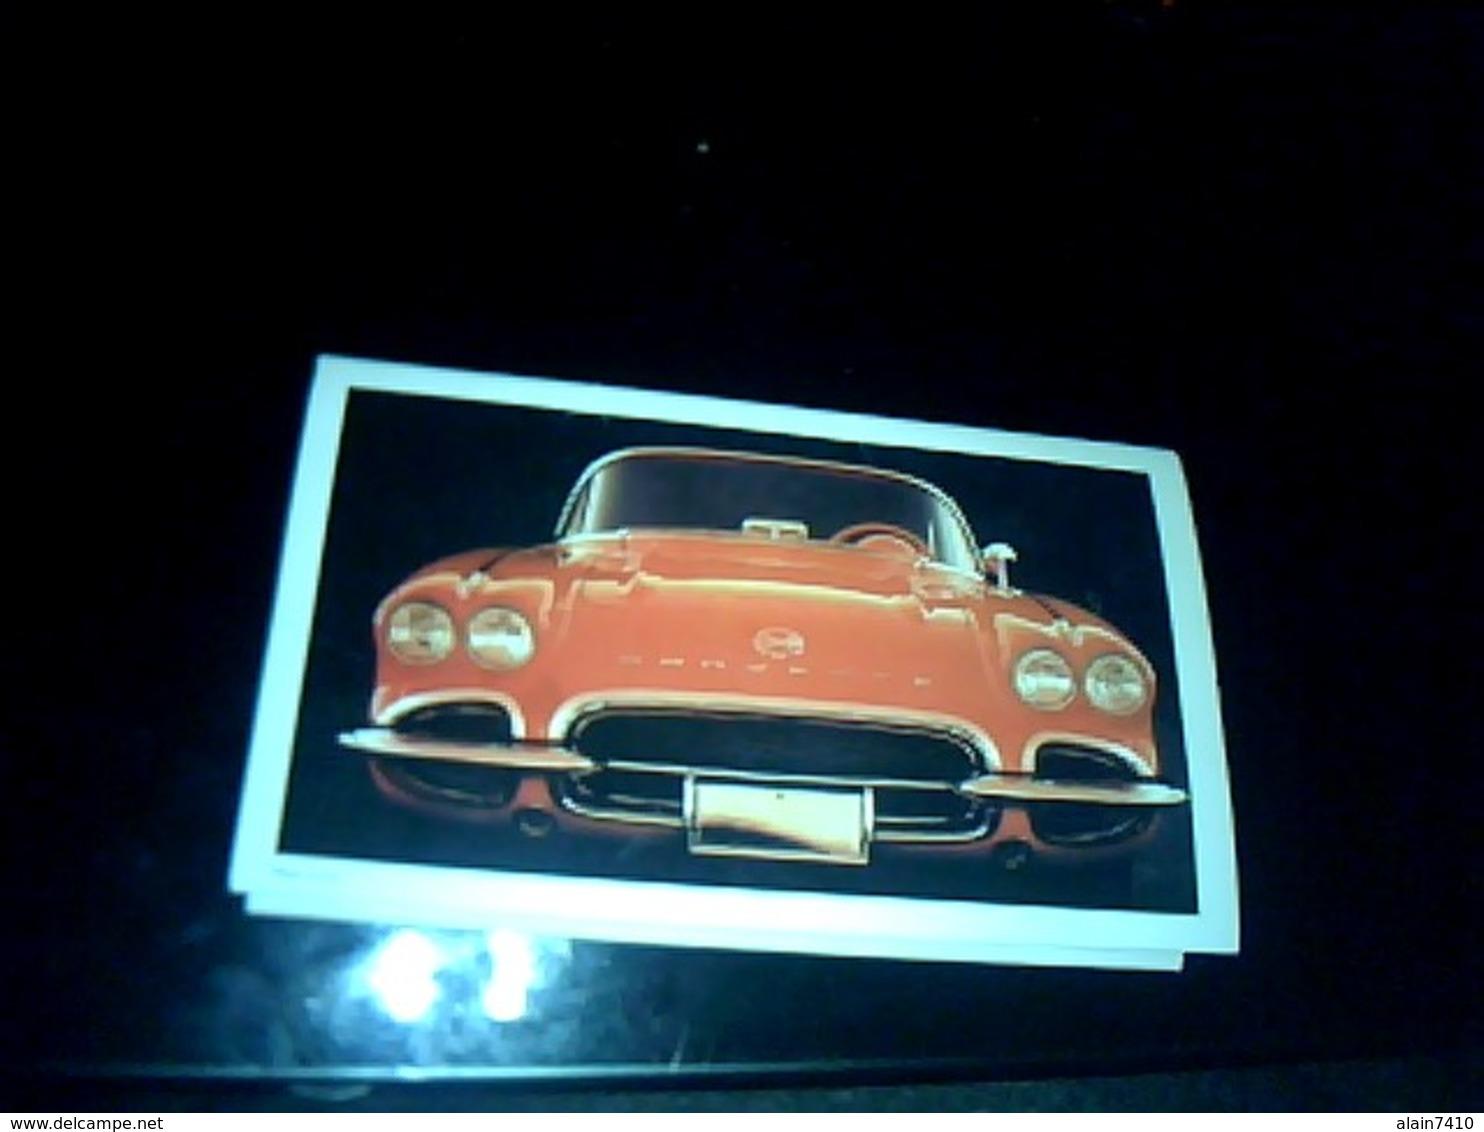 Calendrier Publiciaire De 1996 Albi Recttification Entète Voiture Corvette - Formato Piccolo : 1991-00